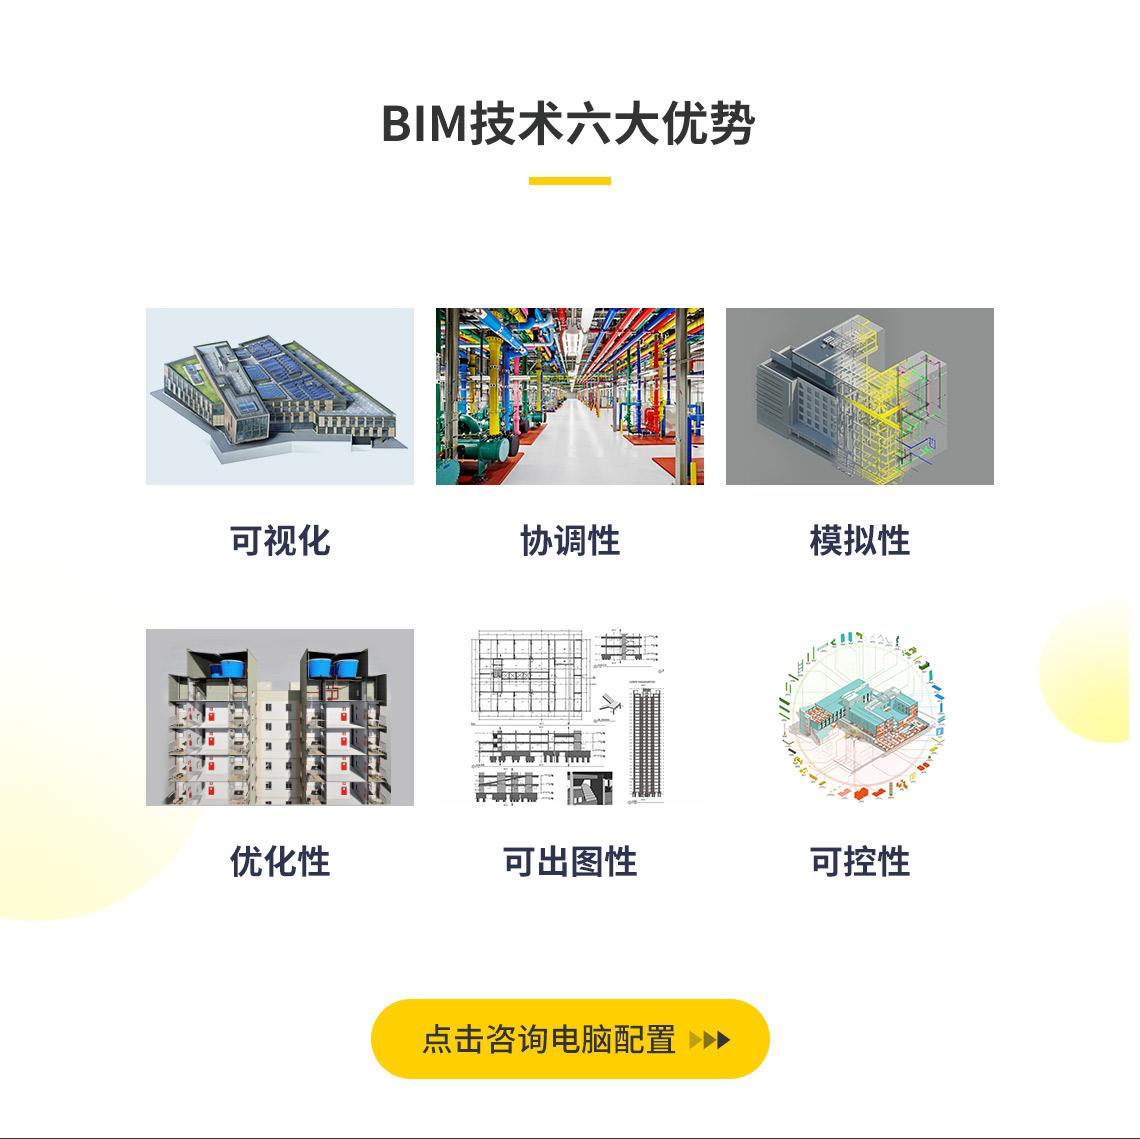 BIM技术具有可视化、协调性、模拟性、优化性、可出图性、可控性等特点,参加BIM等级考试取得证书,课获取额外的经济收入。